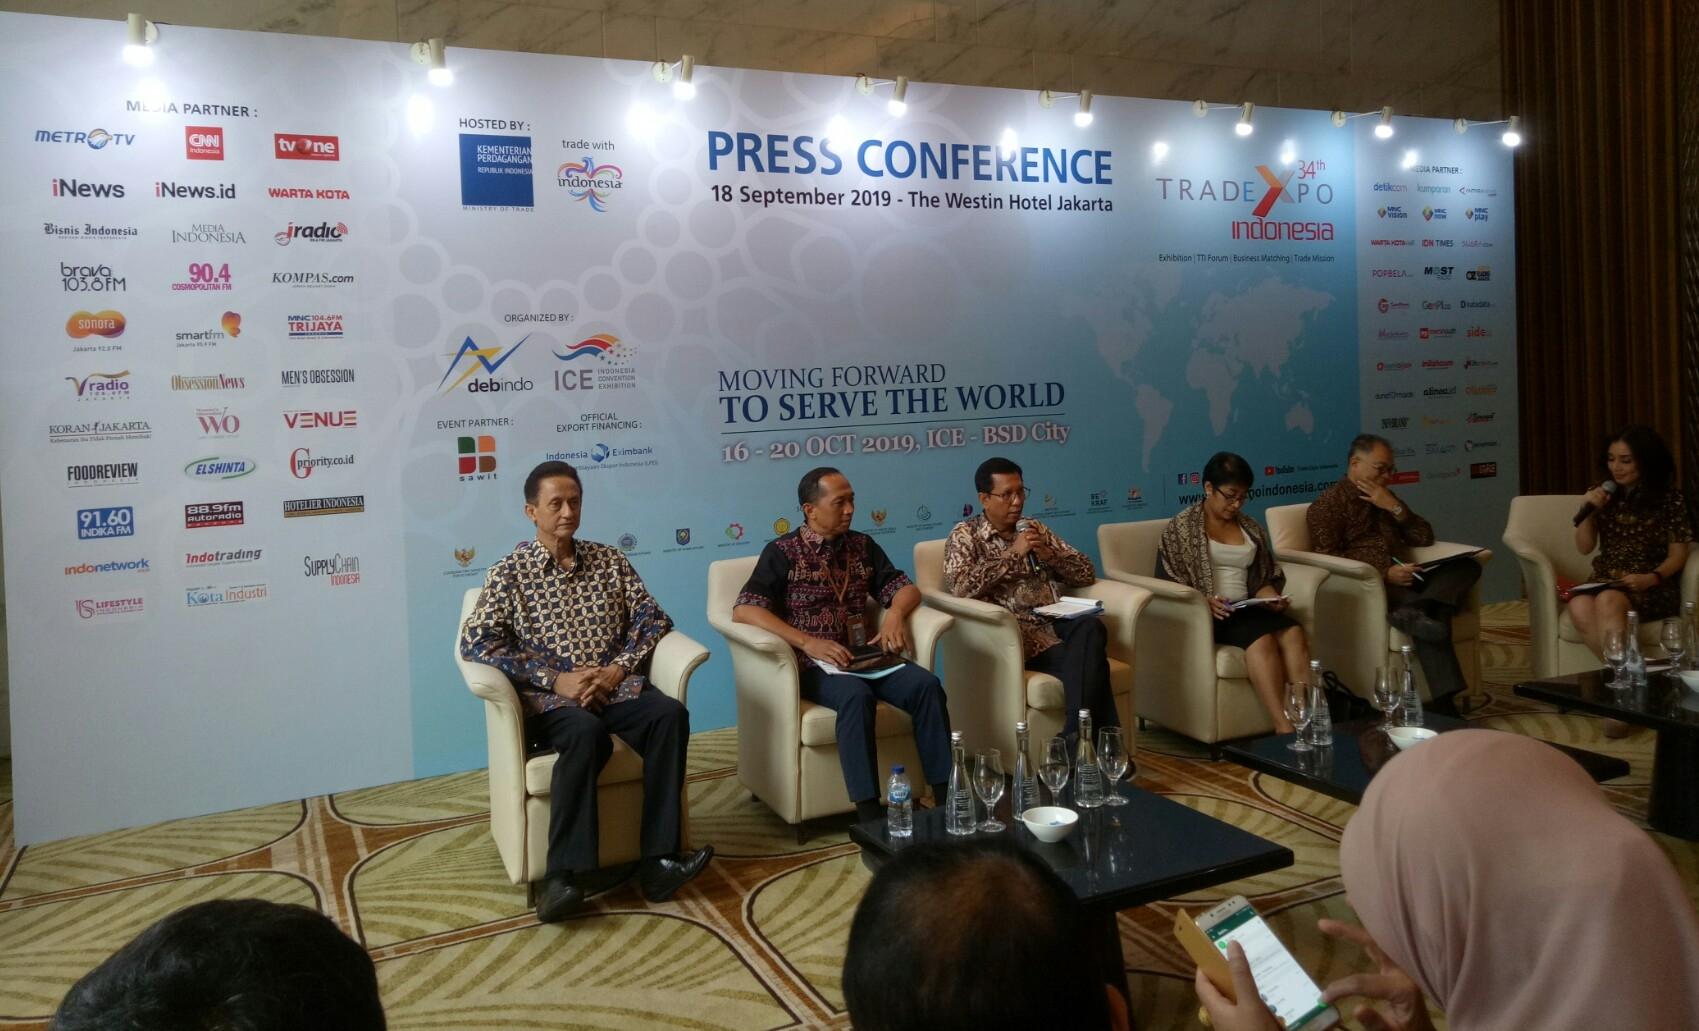 Transaksi Trade Expo Indonesia 2019 Dibidik Naik 15%